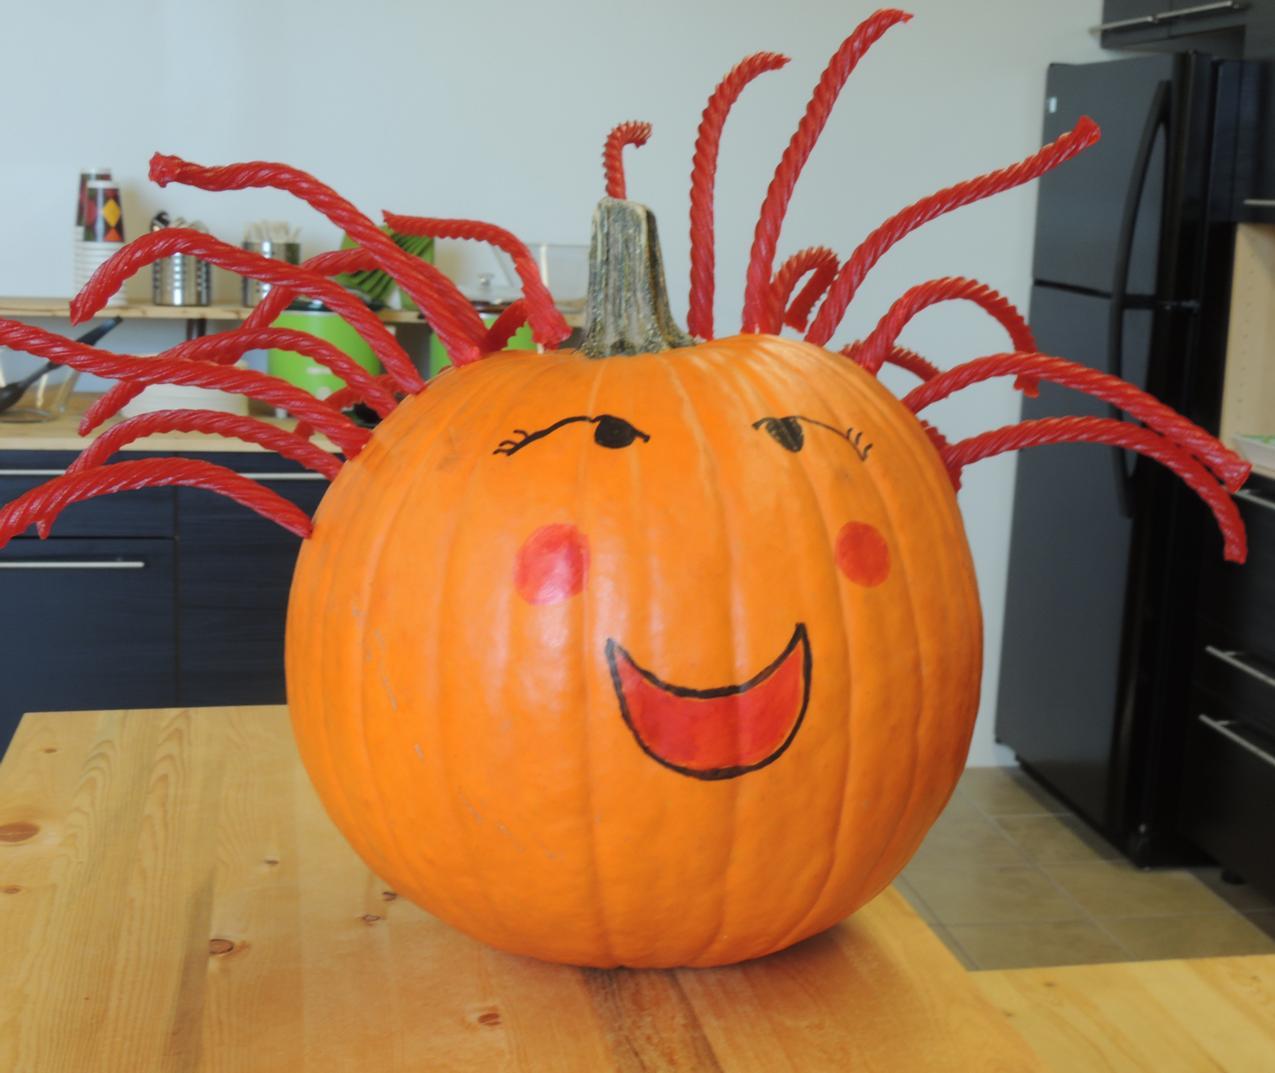 How to make a LicoricePumpkin